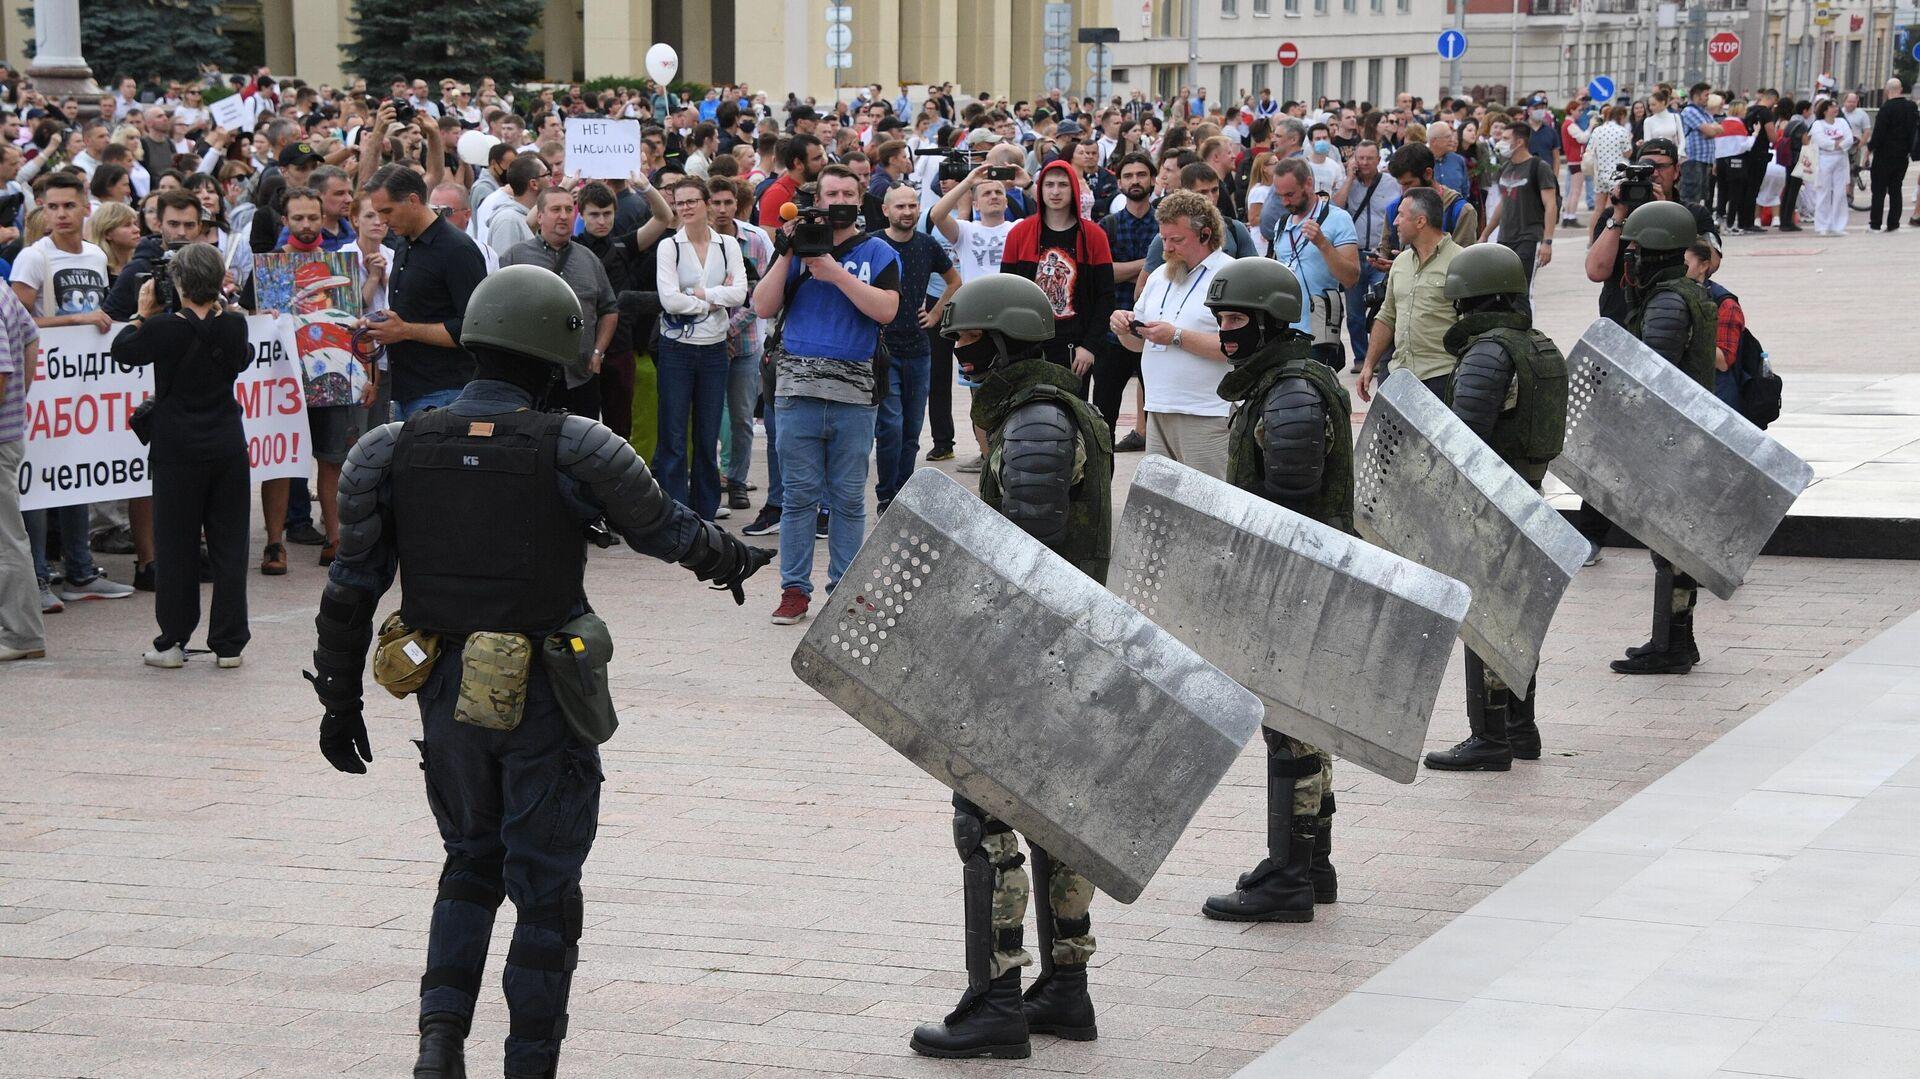 Участники акции протеста и военнослужащие в Минске - РИА Новости, 1920, 05.12.2020